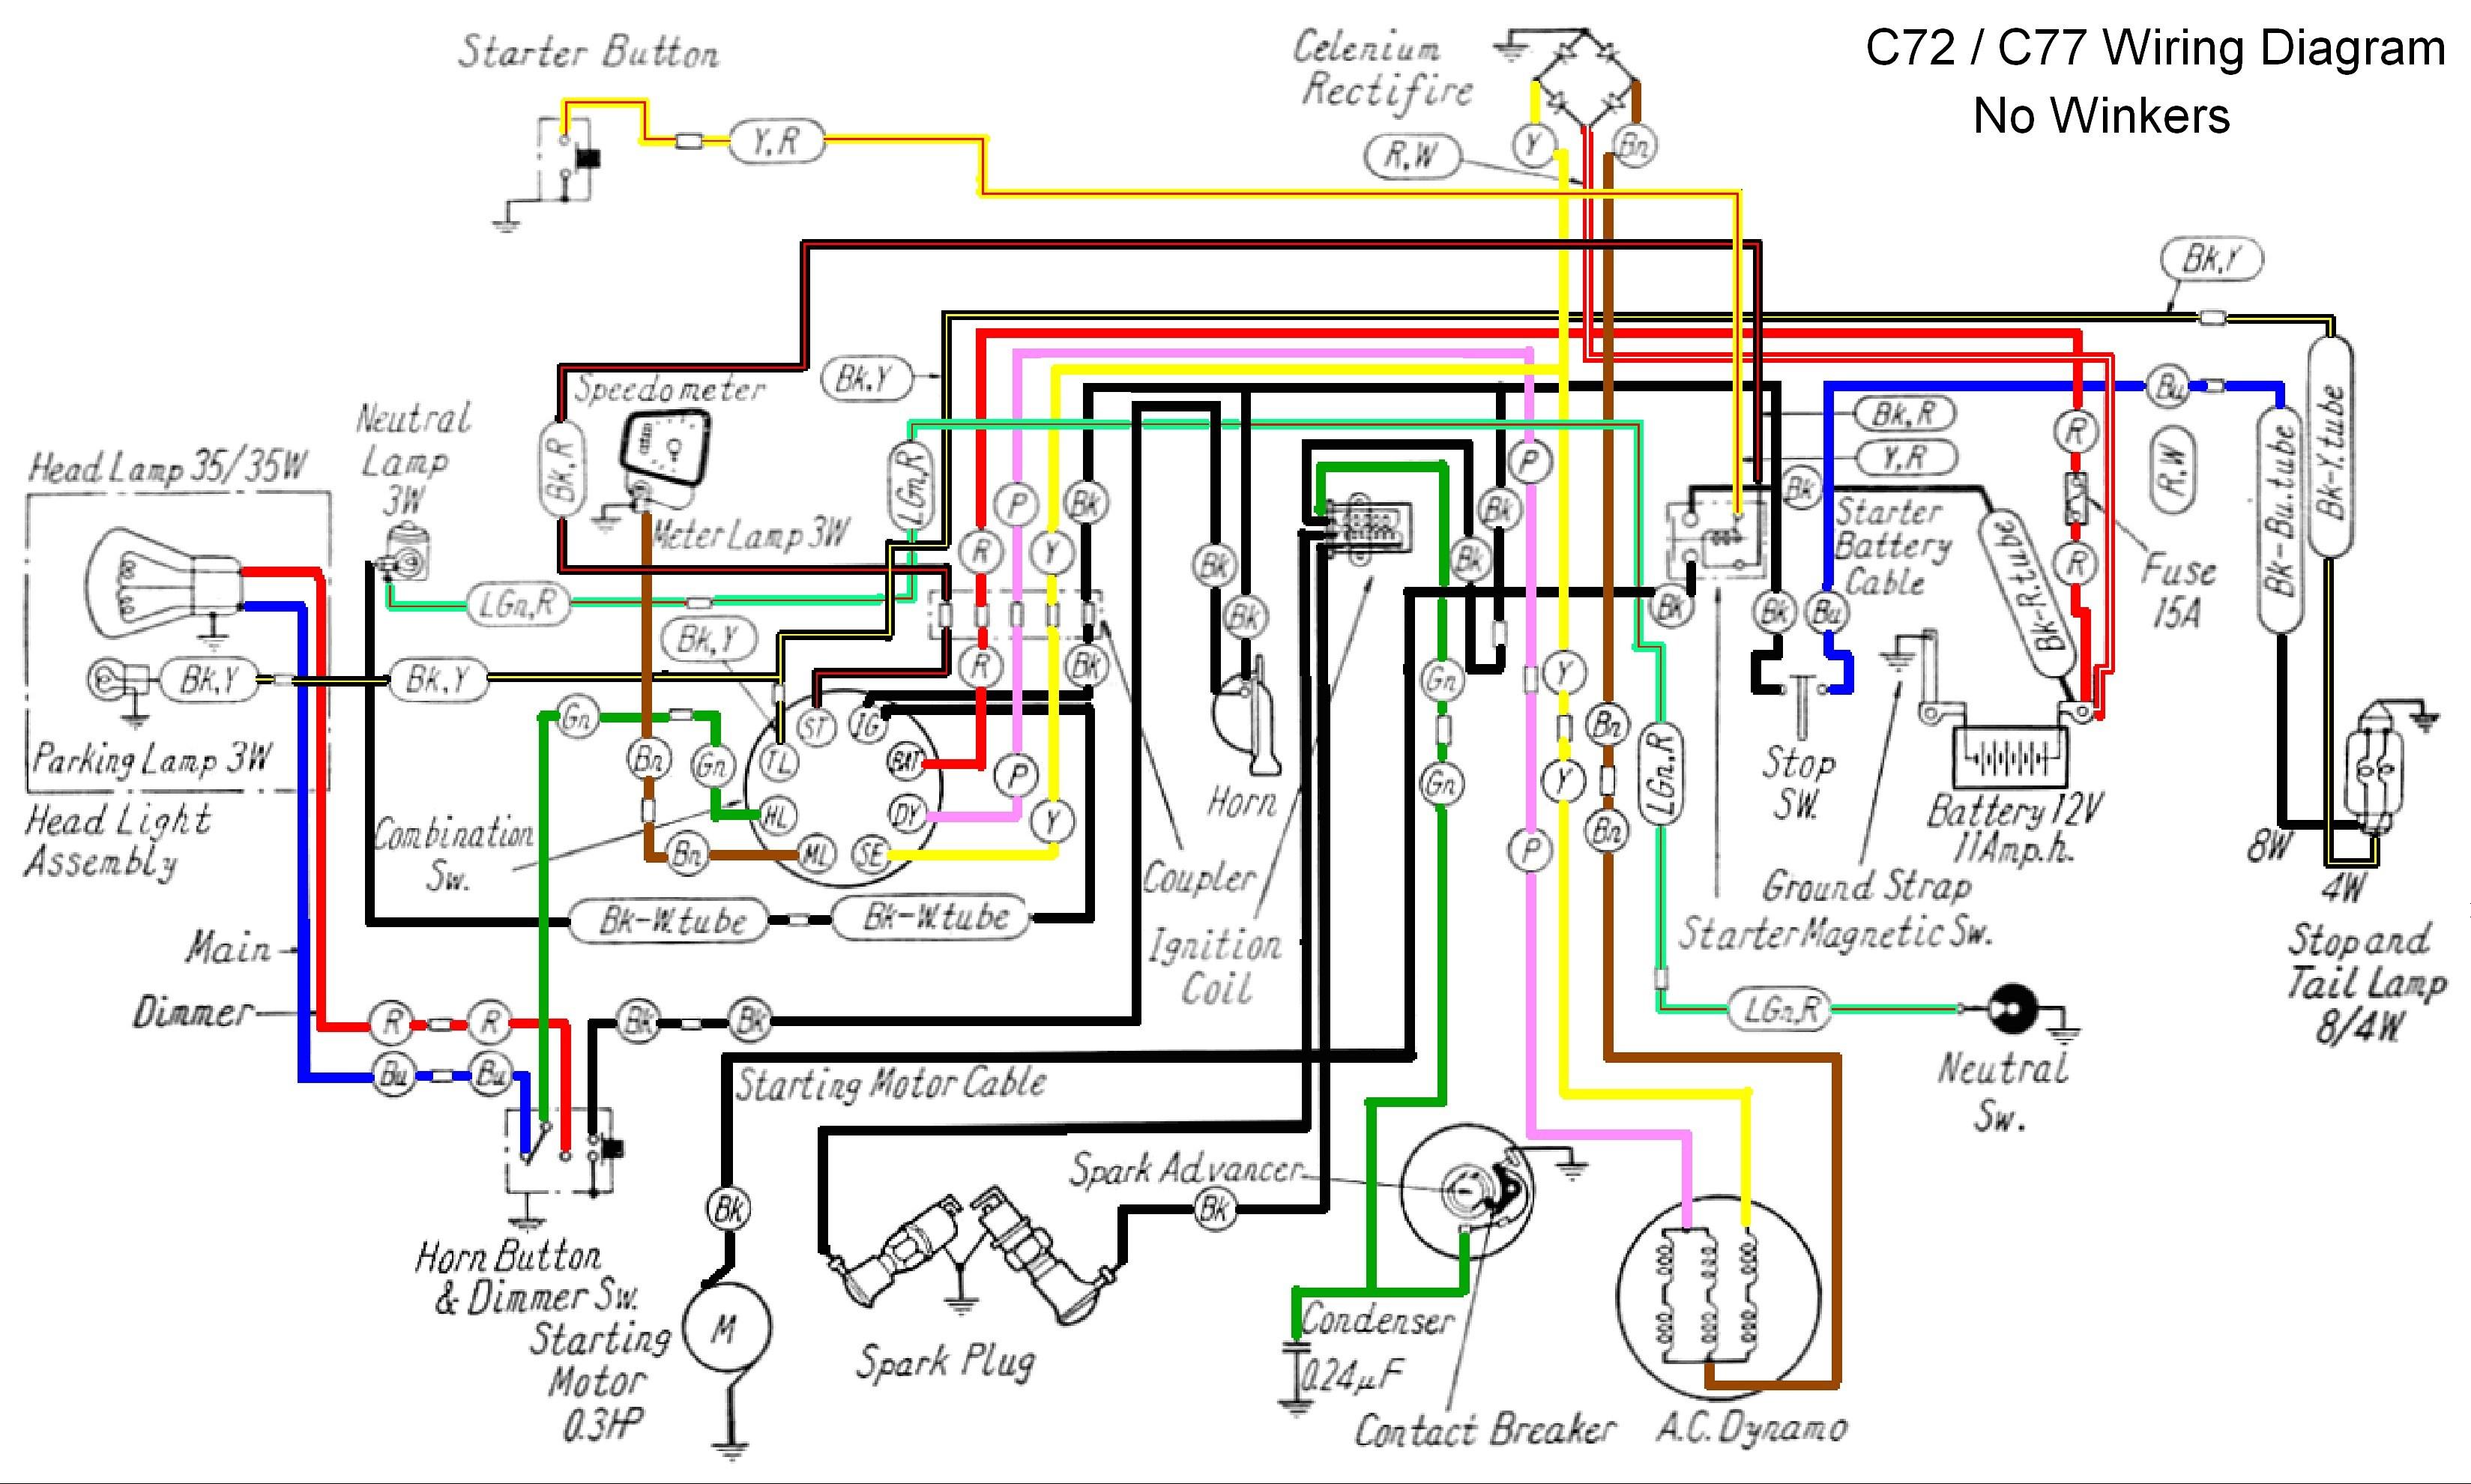 honda helix wiring diagram - Wiring Diagram